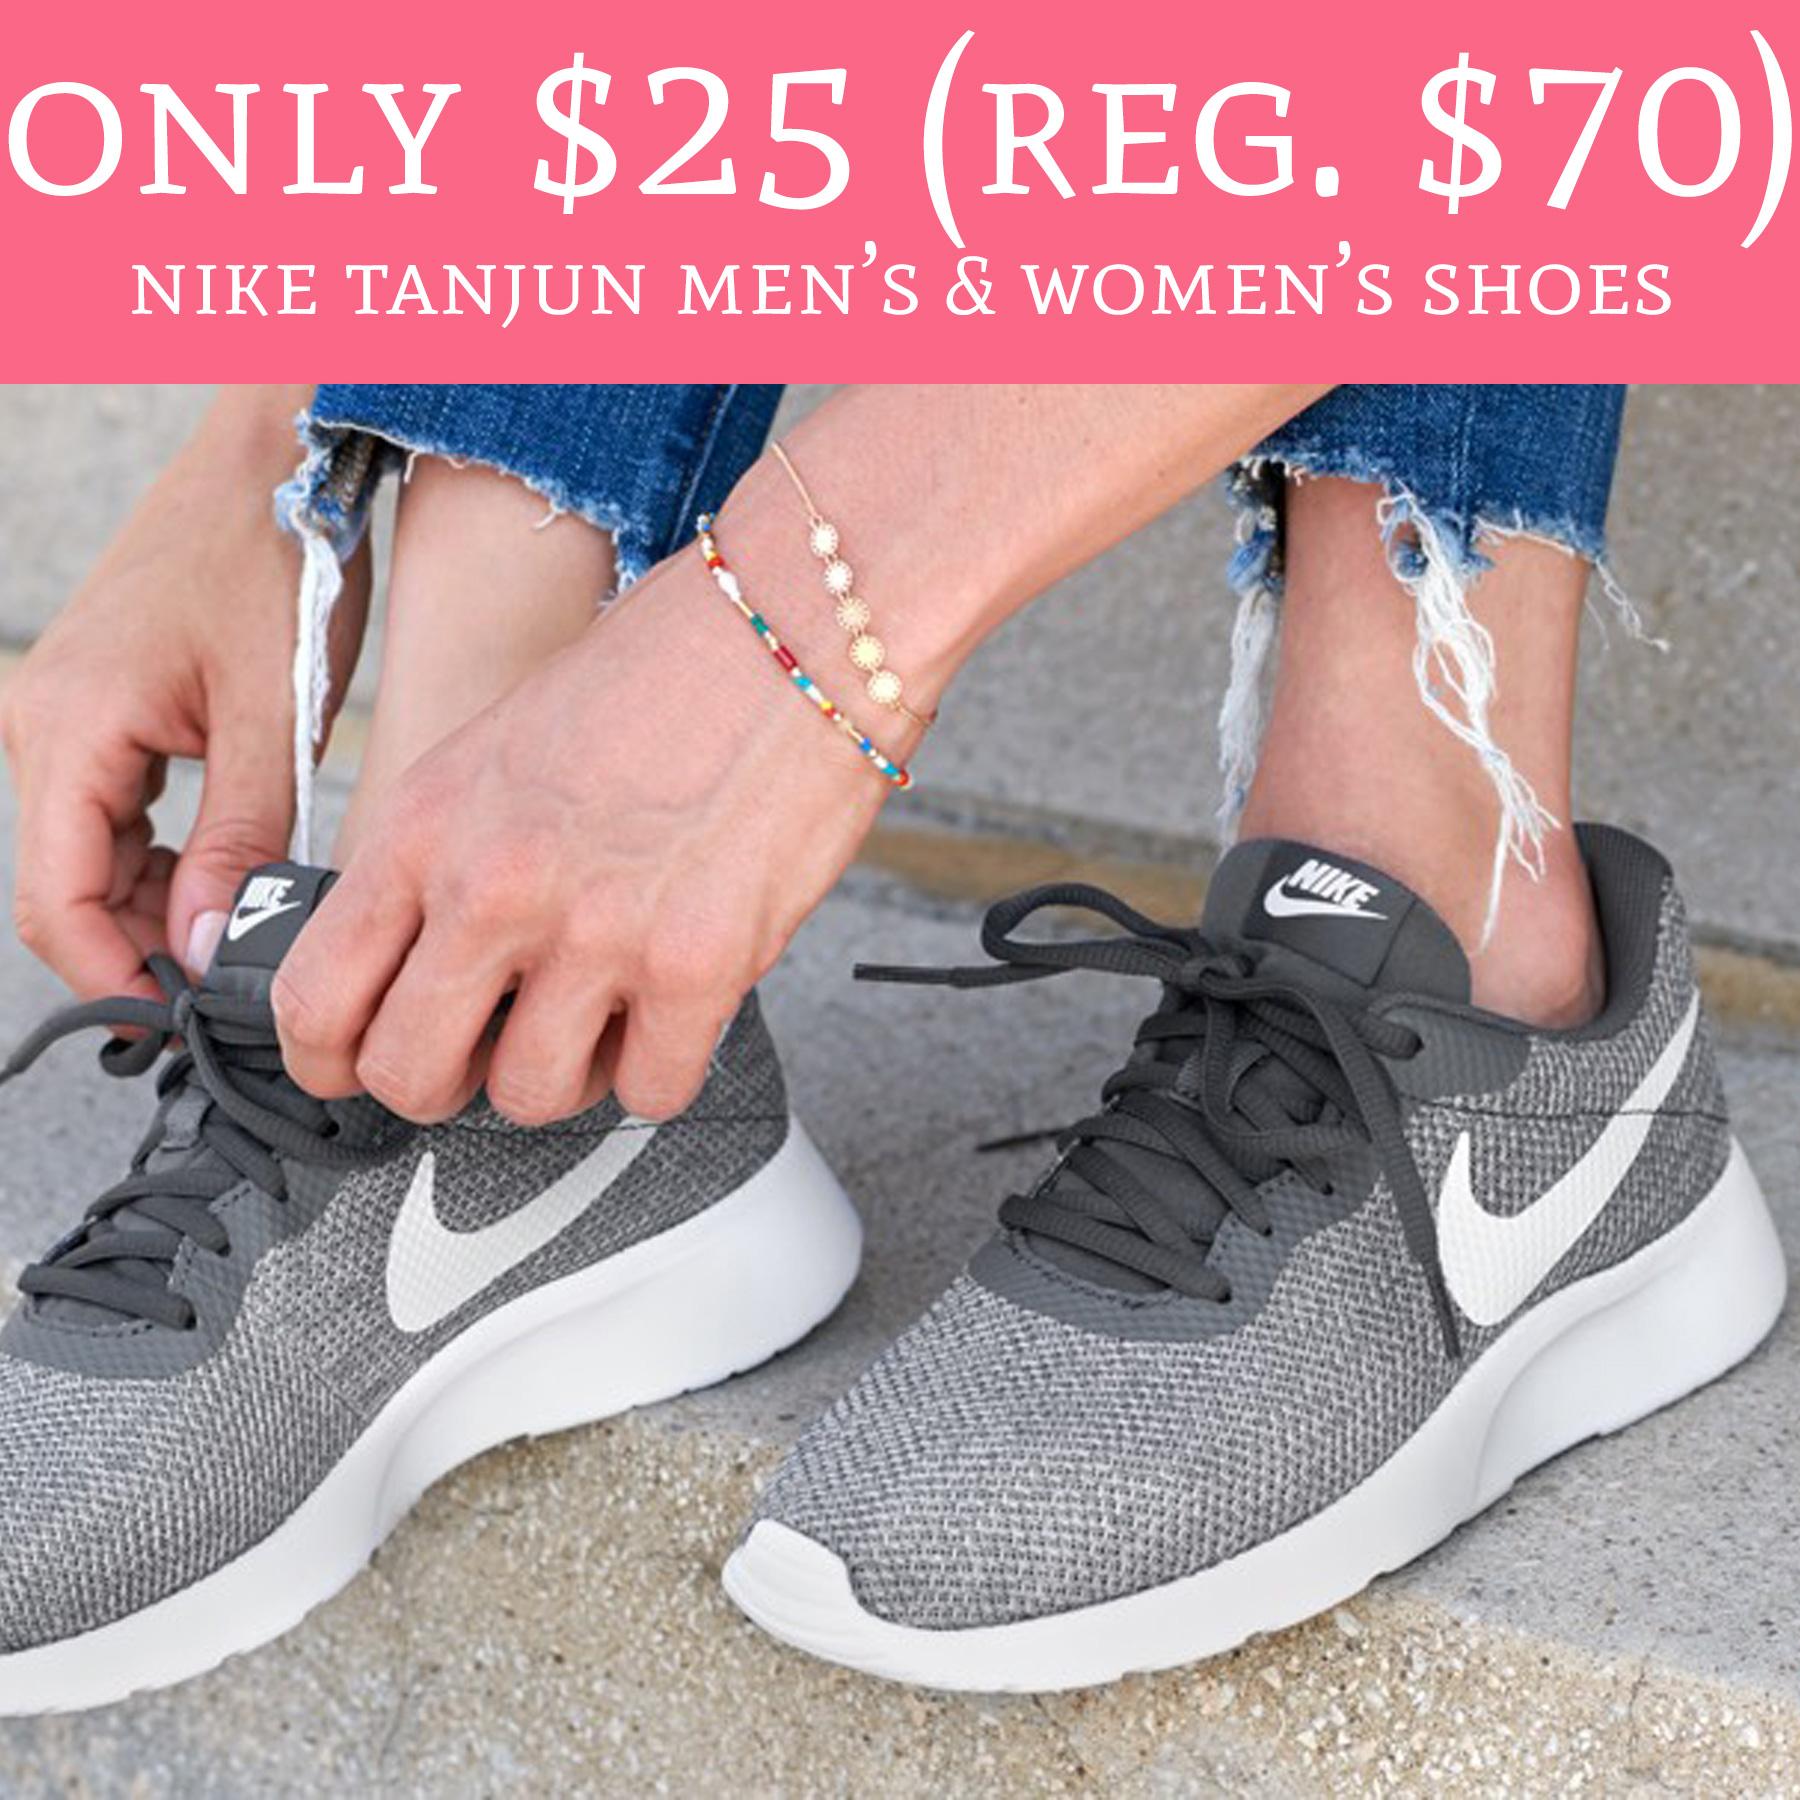 c10518a6736c05 Only  25 (Regular  70) Nike Tanjun Men s   Women s Shoes - Deal Hunting Babe